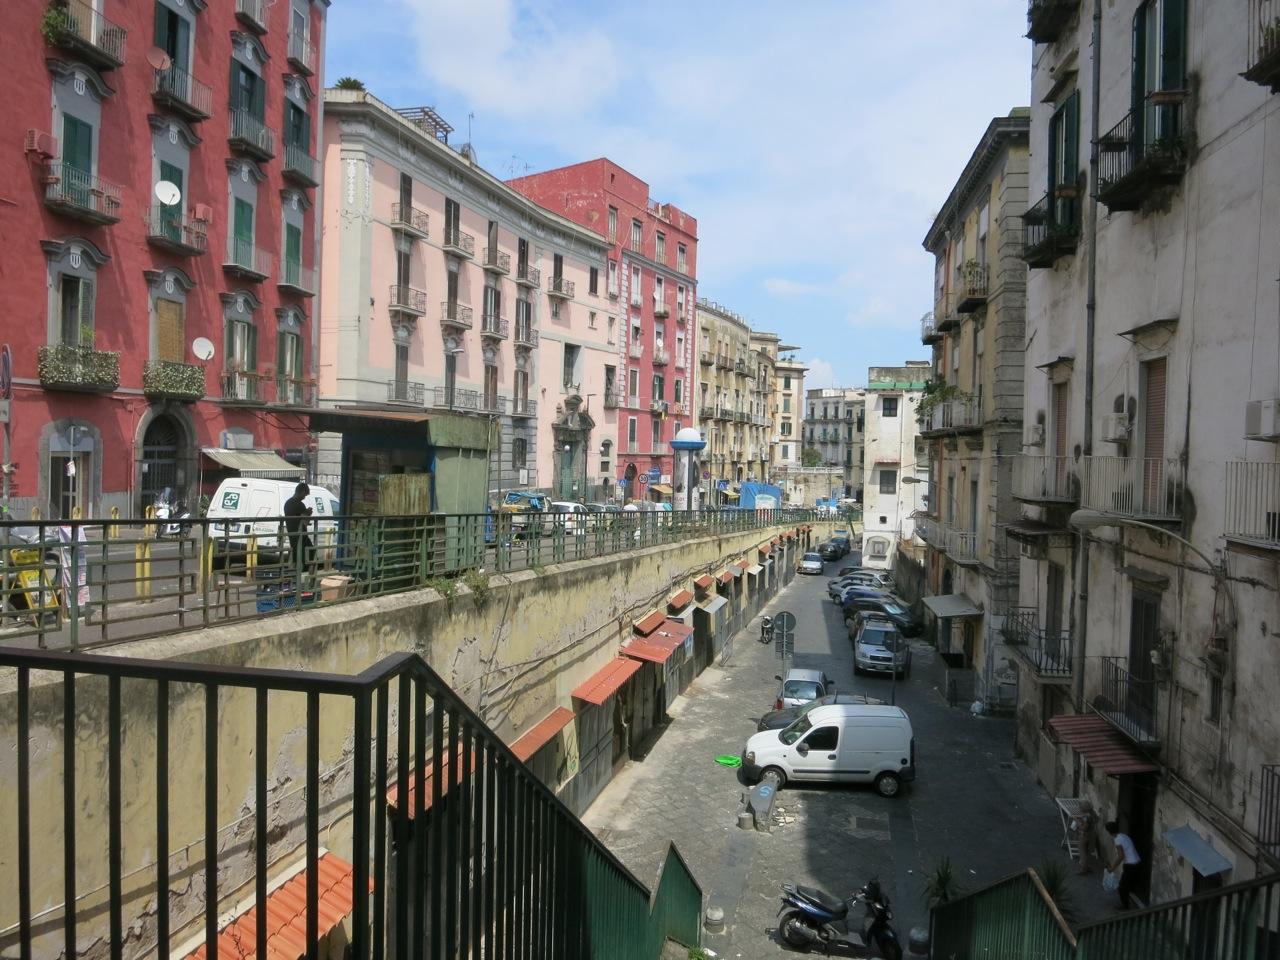 Napoli 1-04